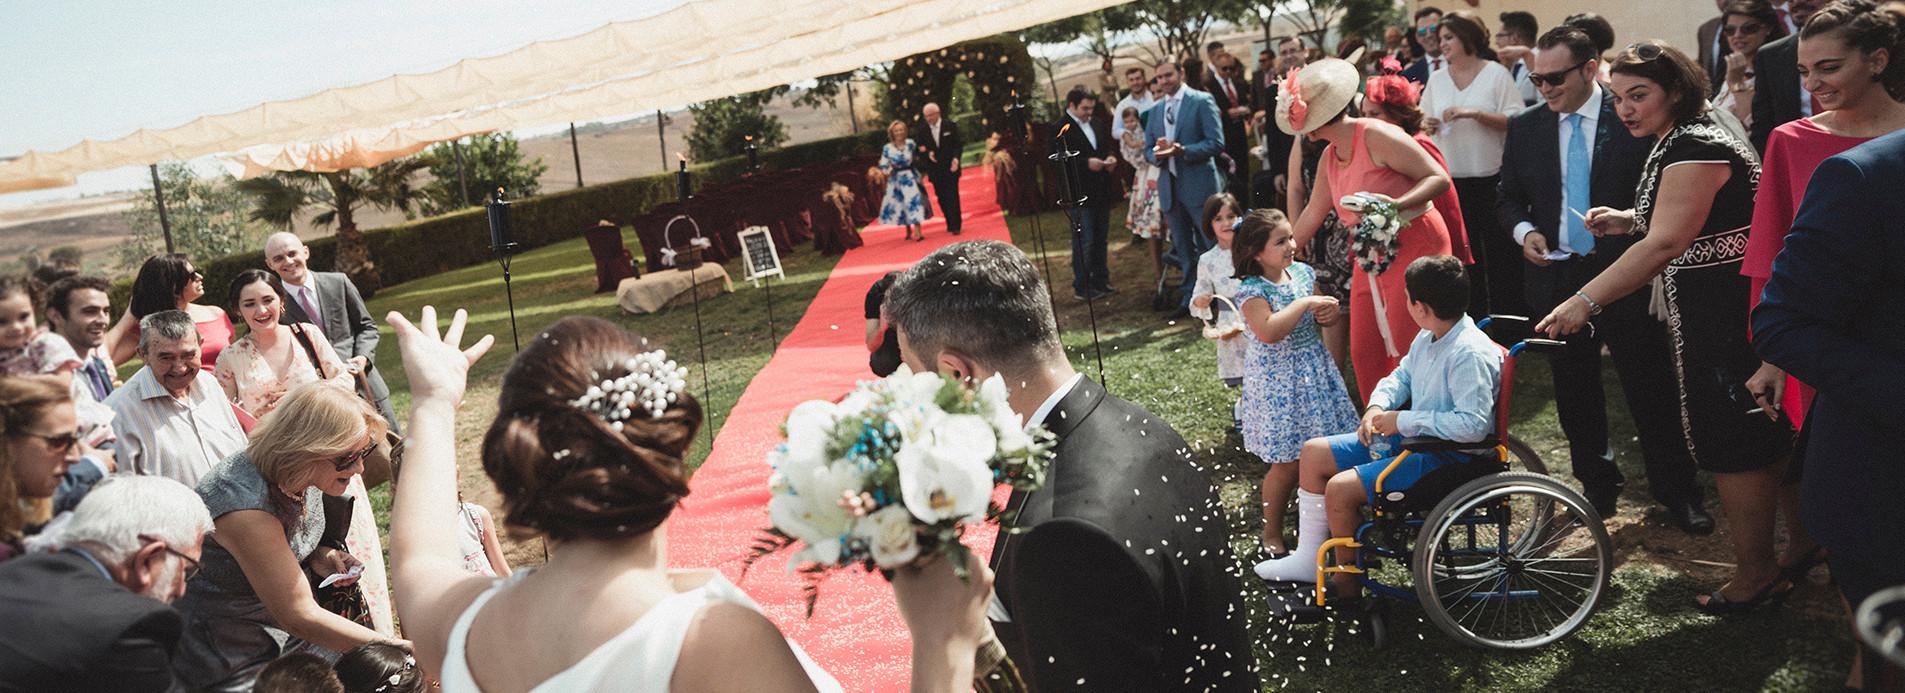 Fotografo bodas badajoz merida sevilla caceres Estrella Diaz Photovisual 43